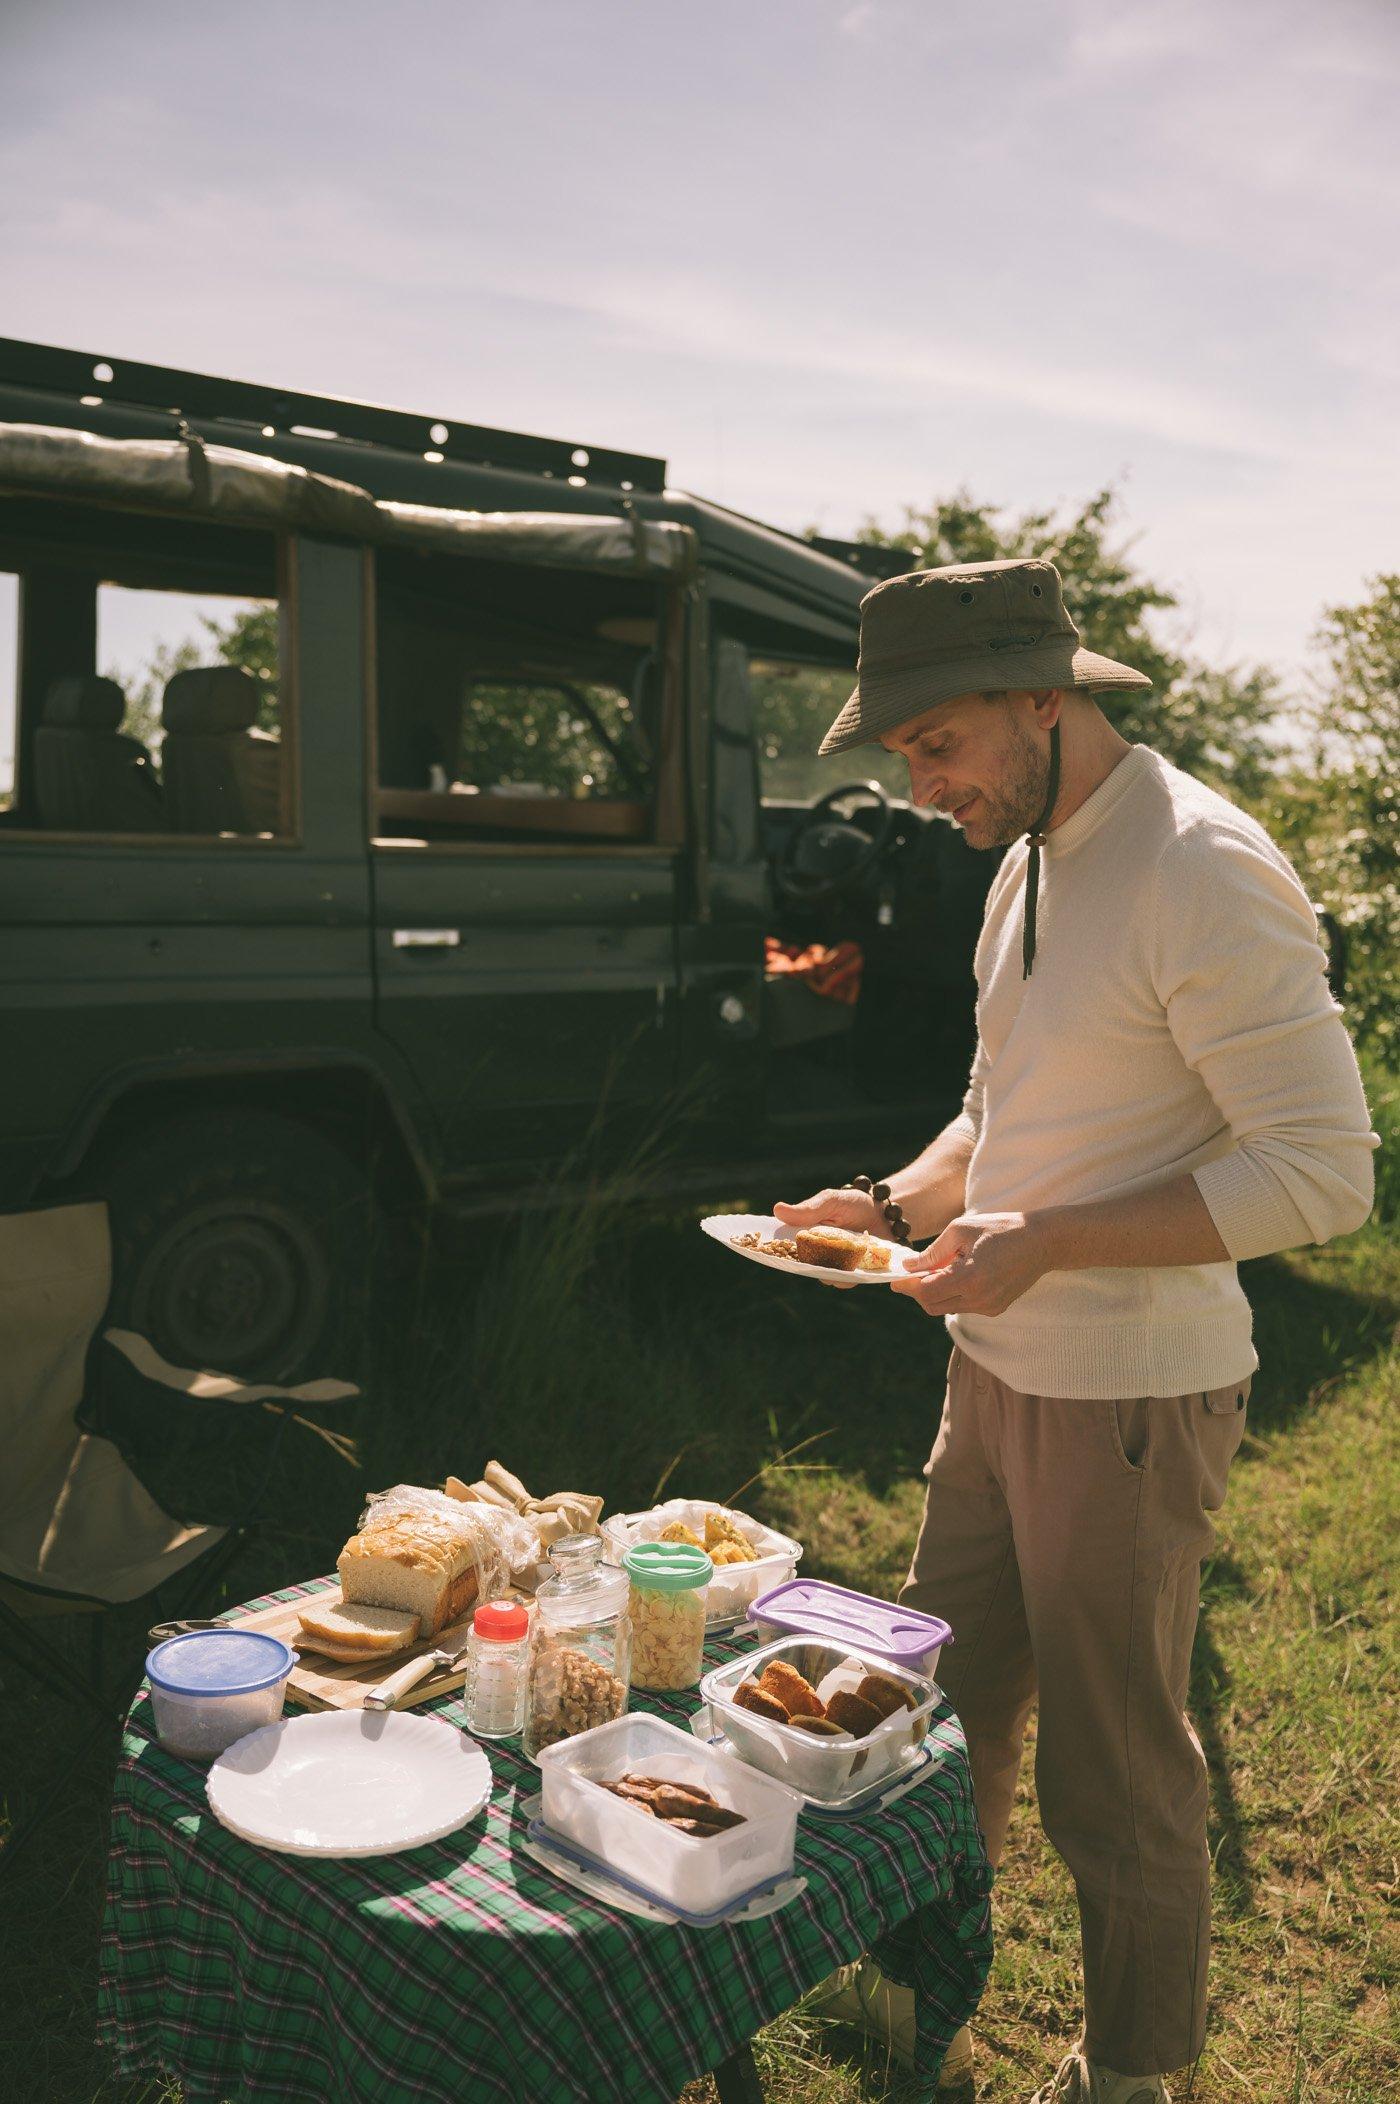 Bush Breakfast at Tangulia Mara Camp in the Maasai Mara in Kenya